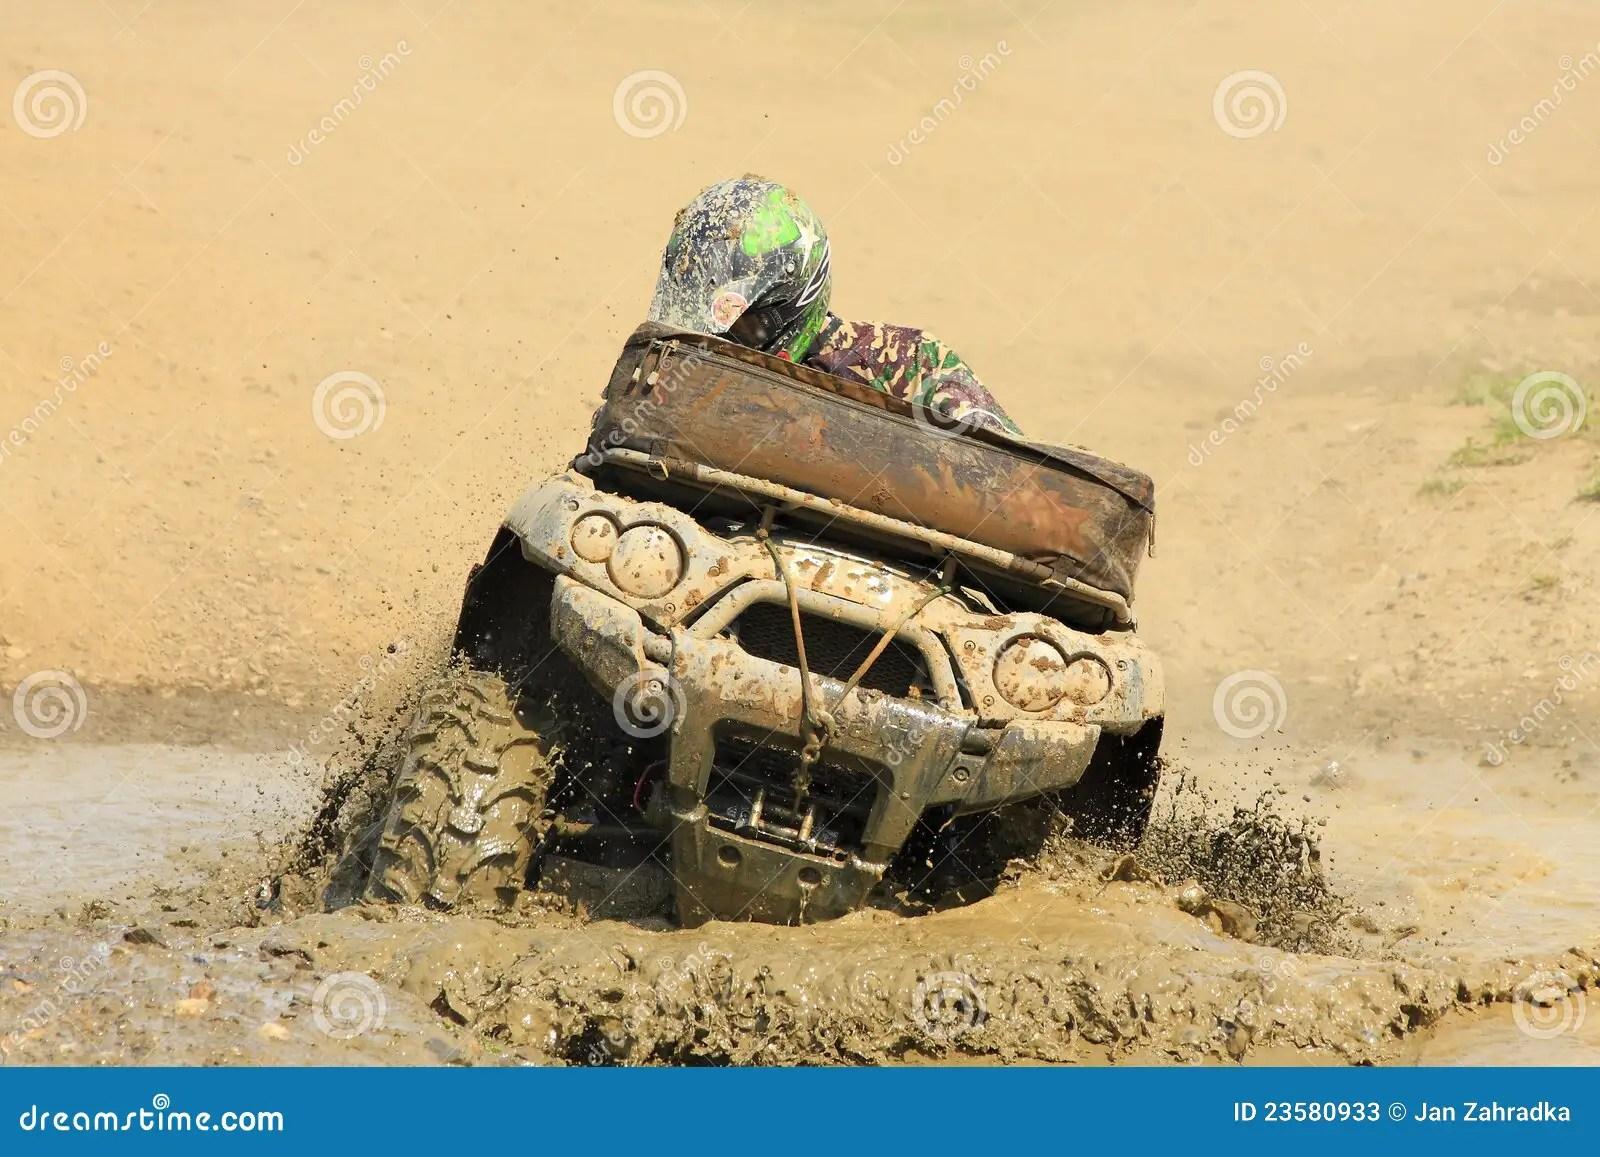 hight resolution of 4 wheeler mud clip art